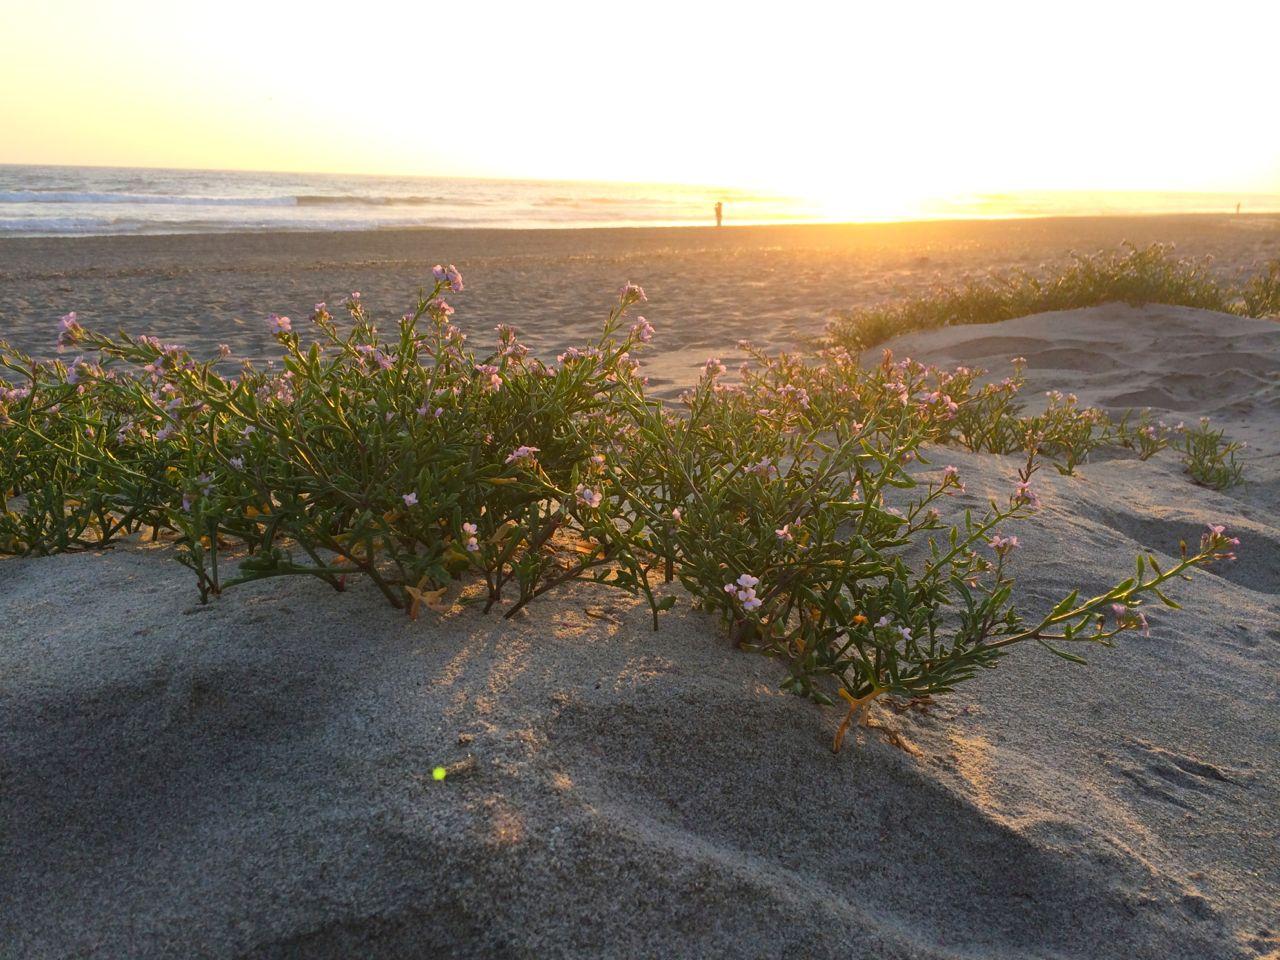 Sunset at Pajaro Dunes, Watsonville, California